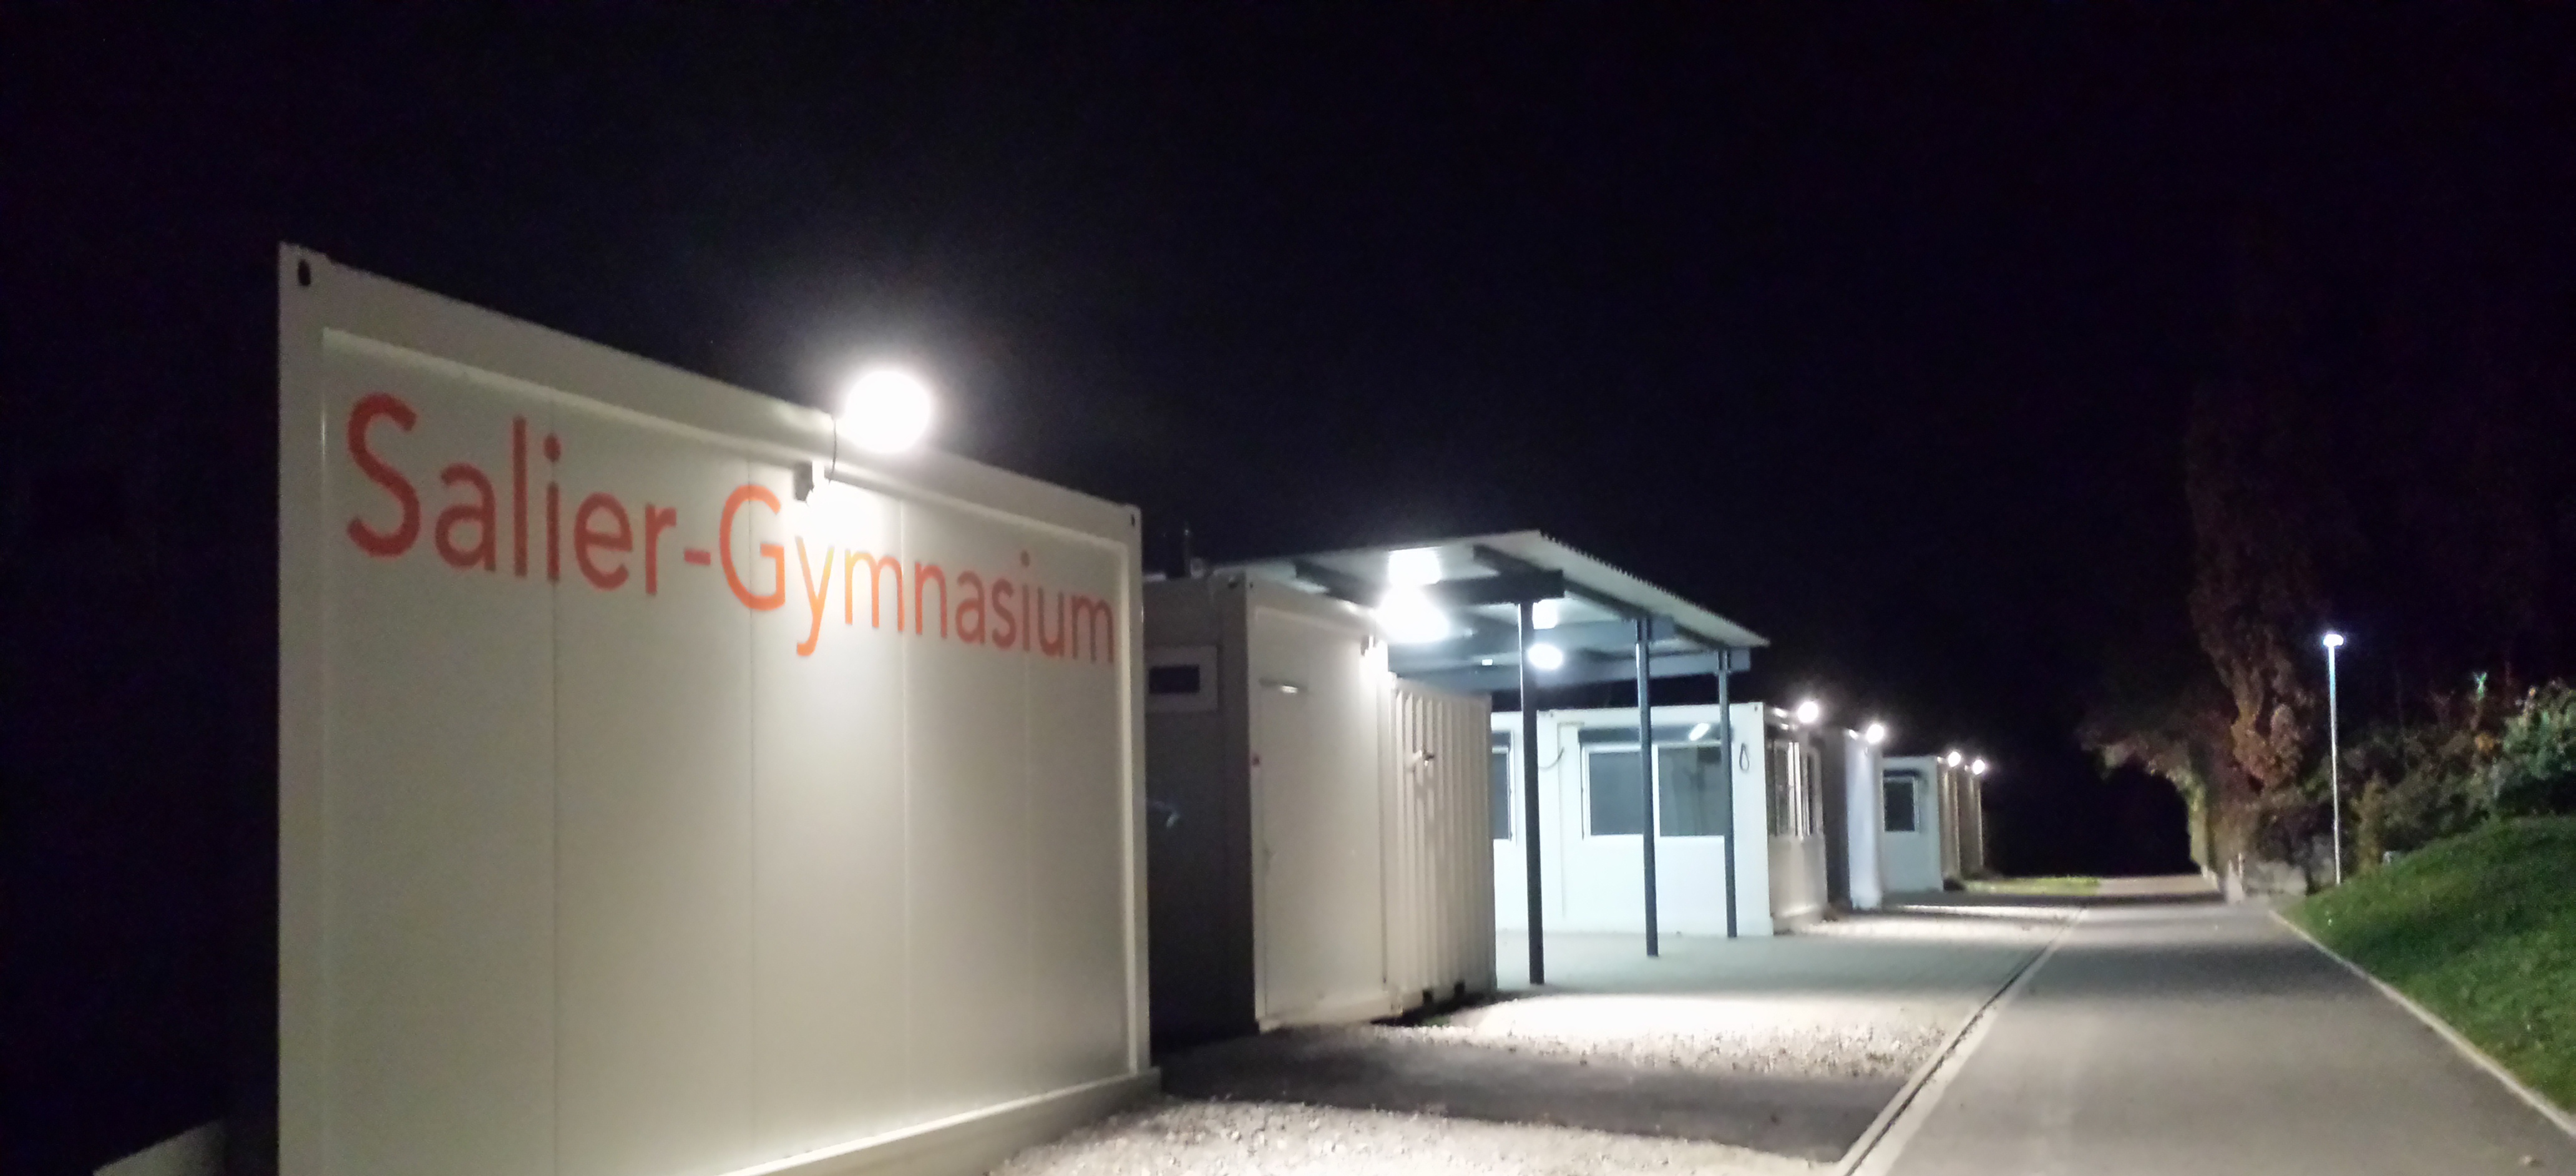 Salier-Gymnasium Waiblingen